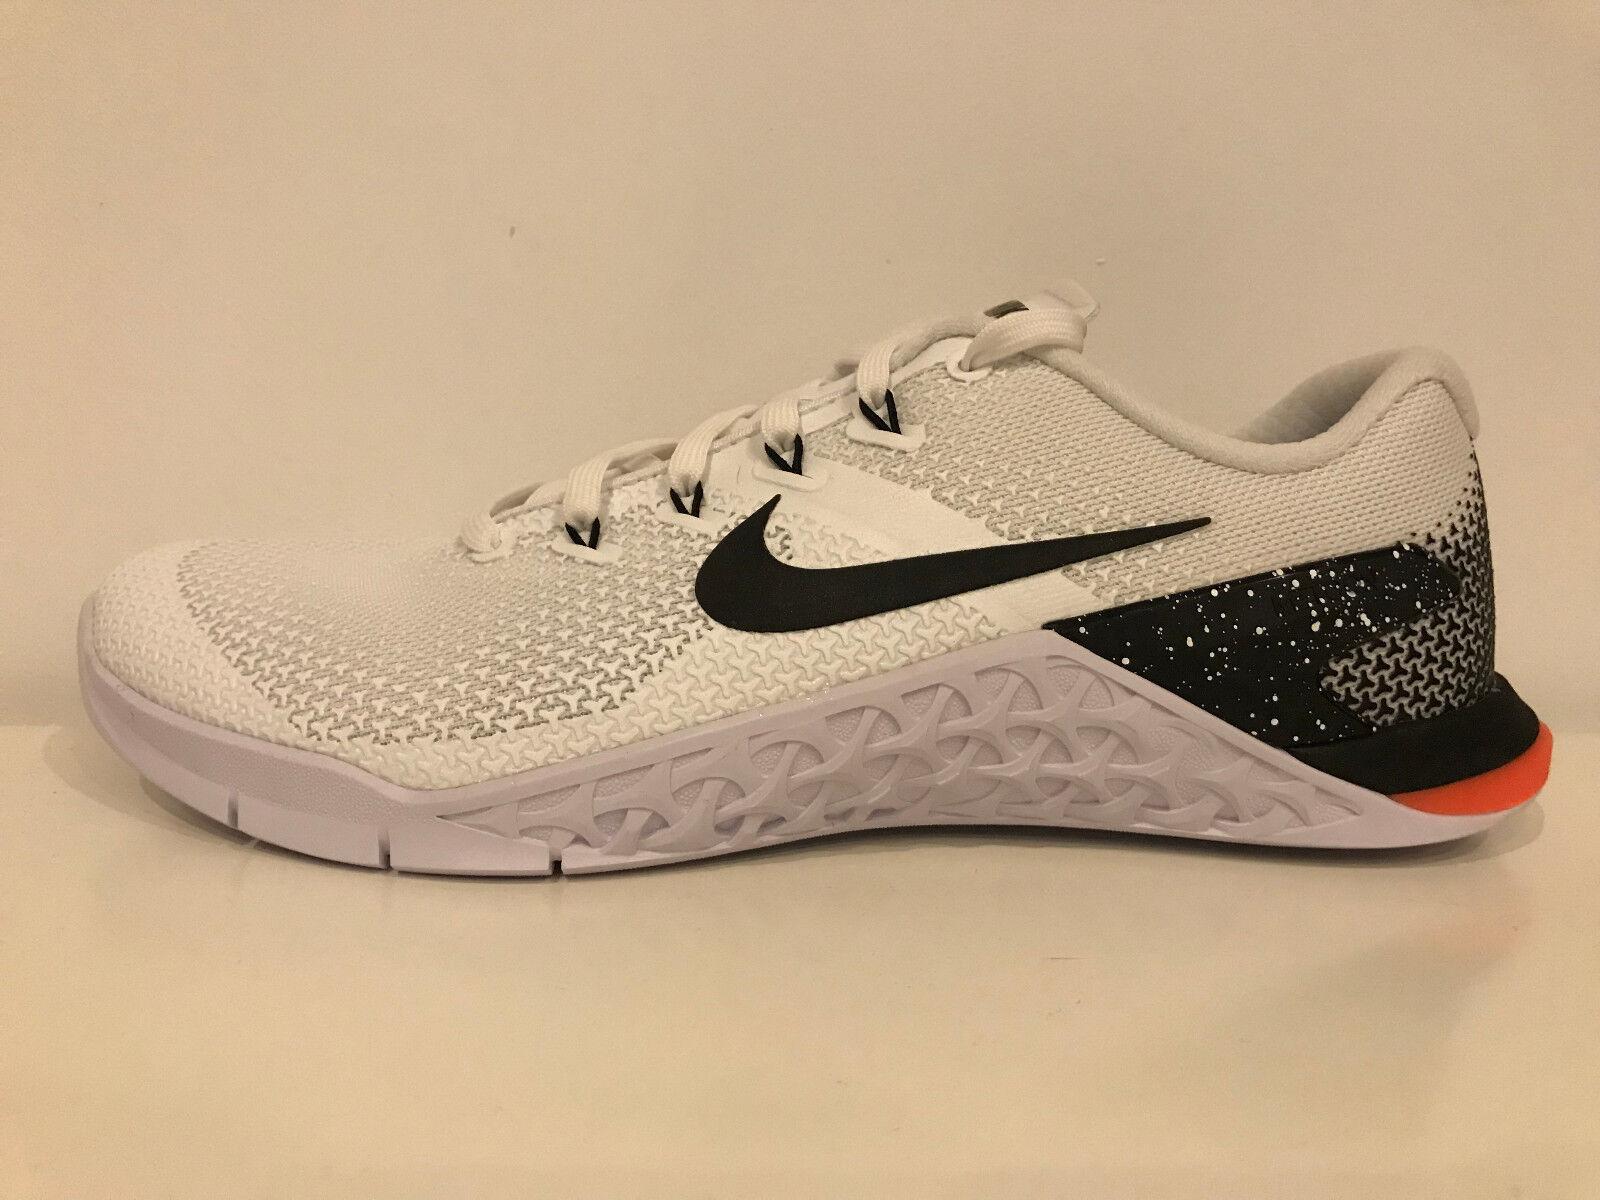 Nike Wmns Metcon 4 IV Damenschuhe Neu Gr. 42,5 Training Fitness